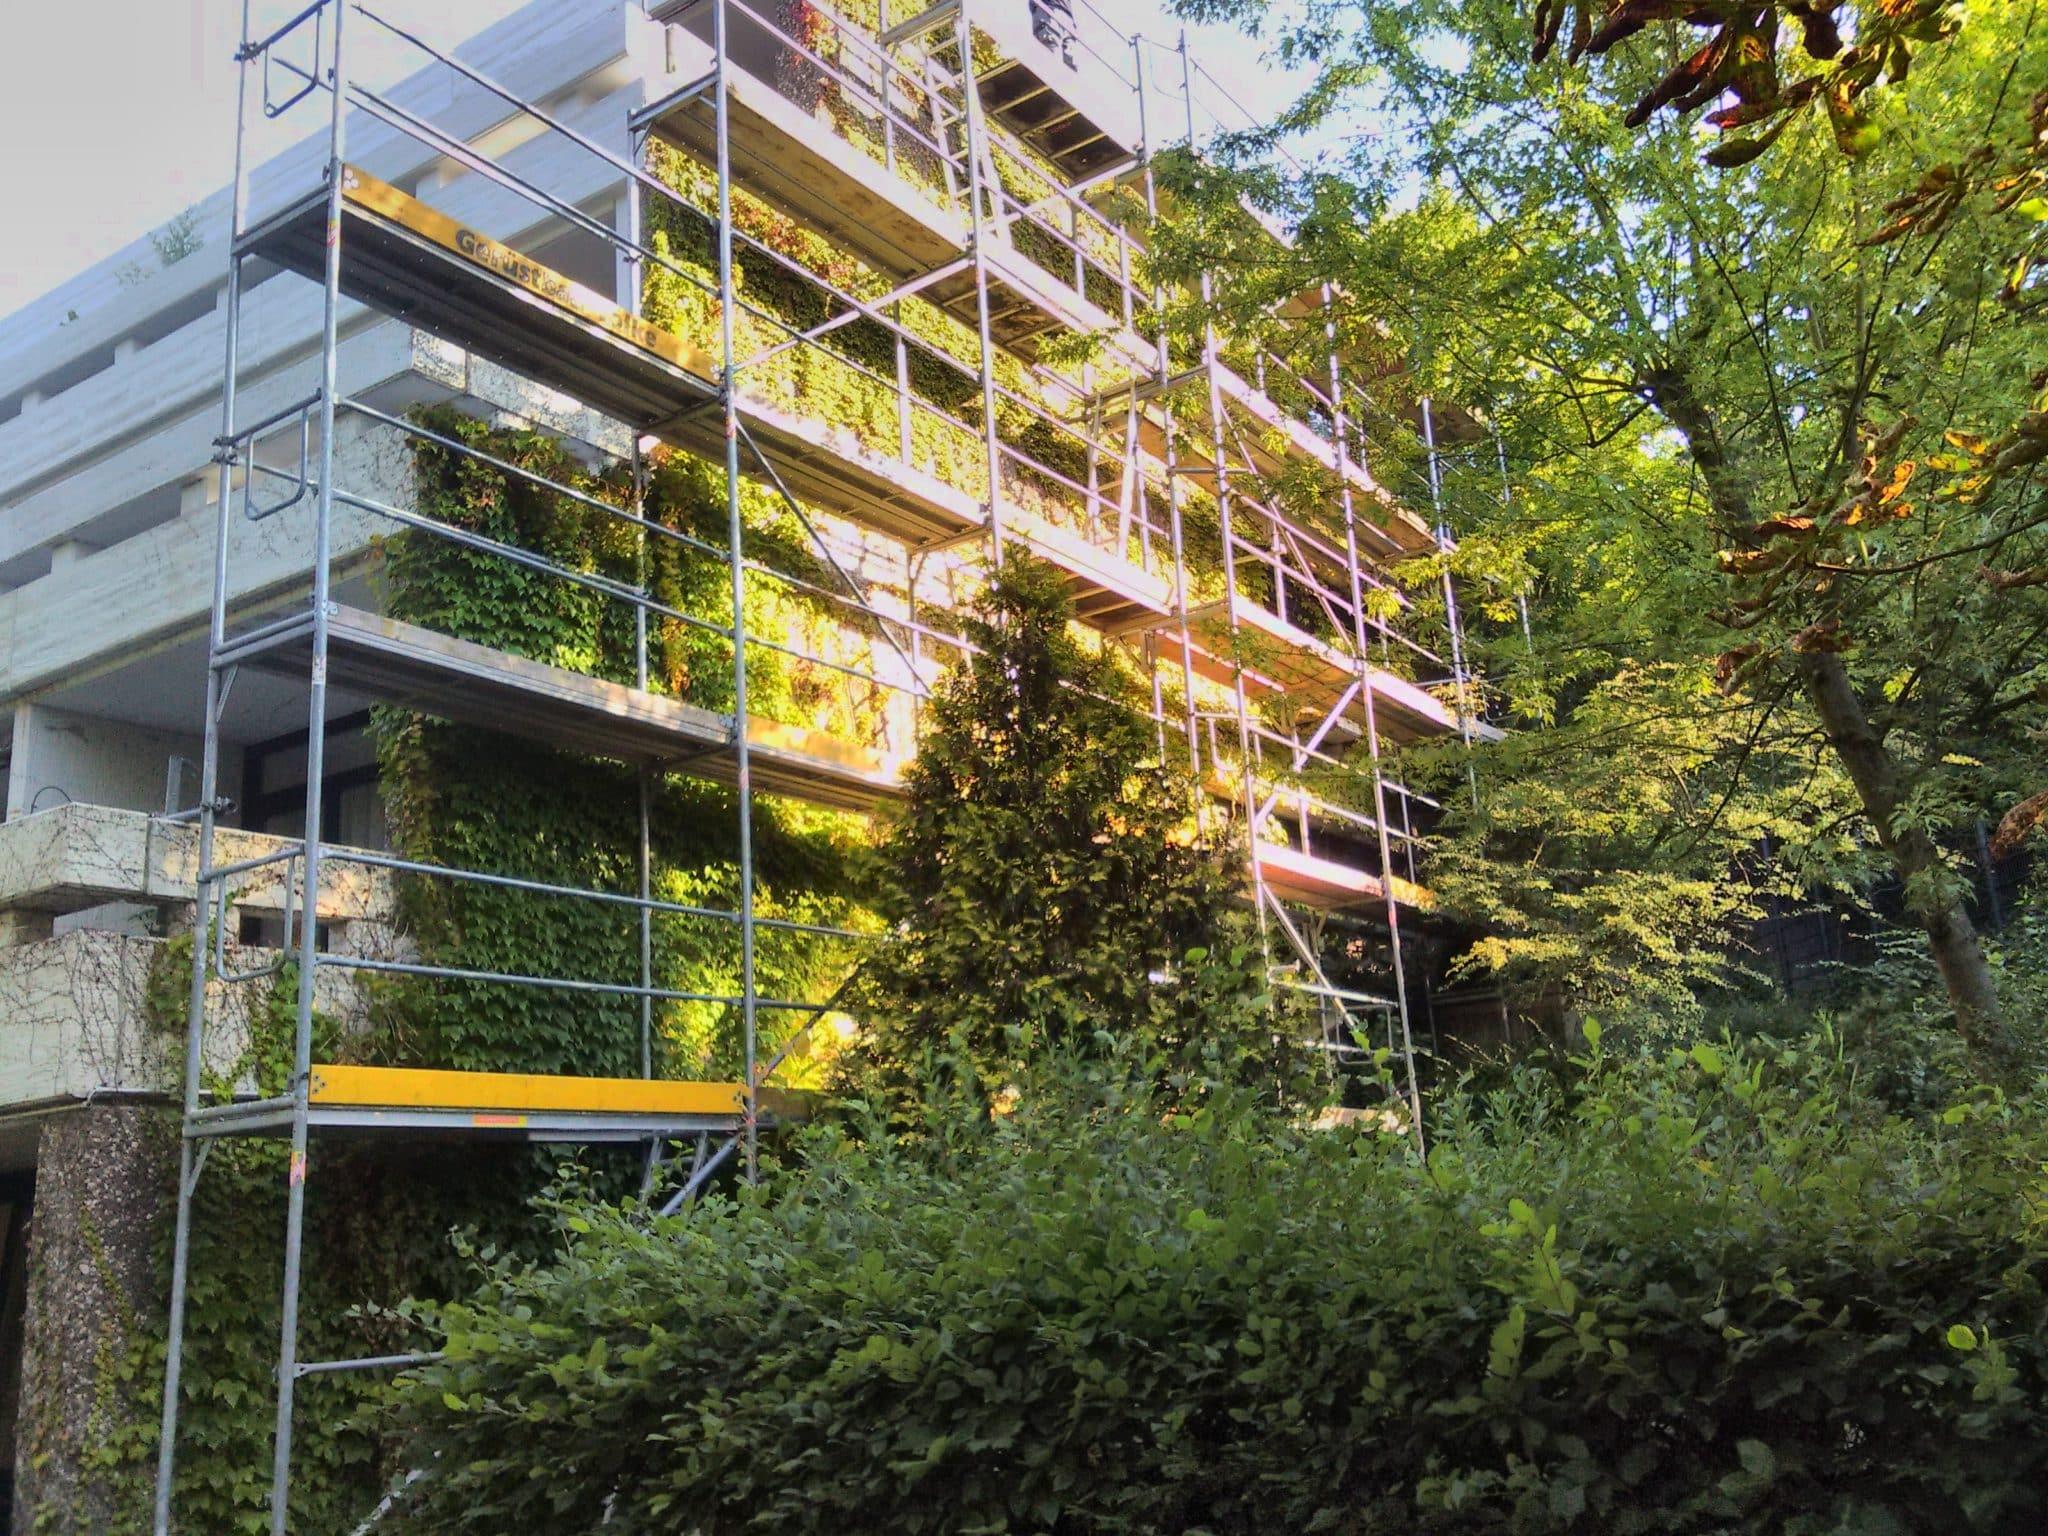 Efeu Beseitigung Bad Oeynhausen